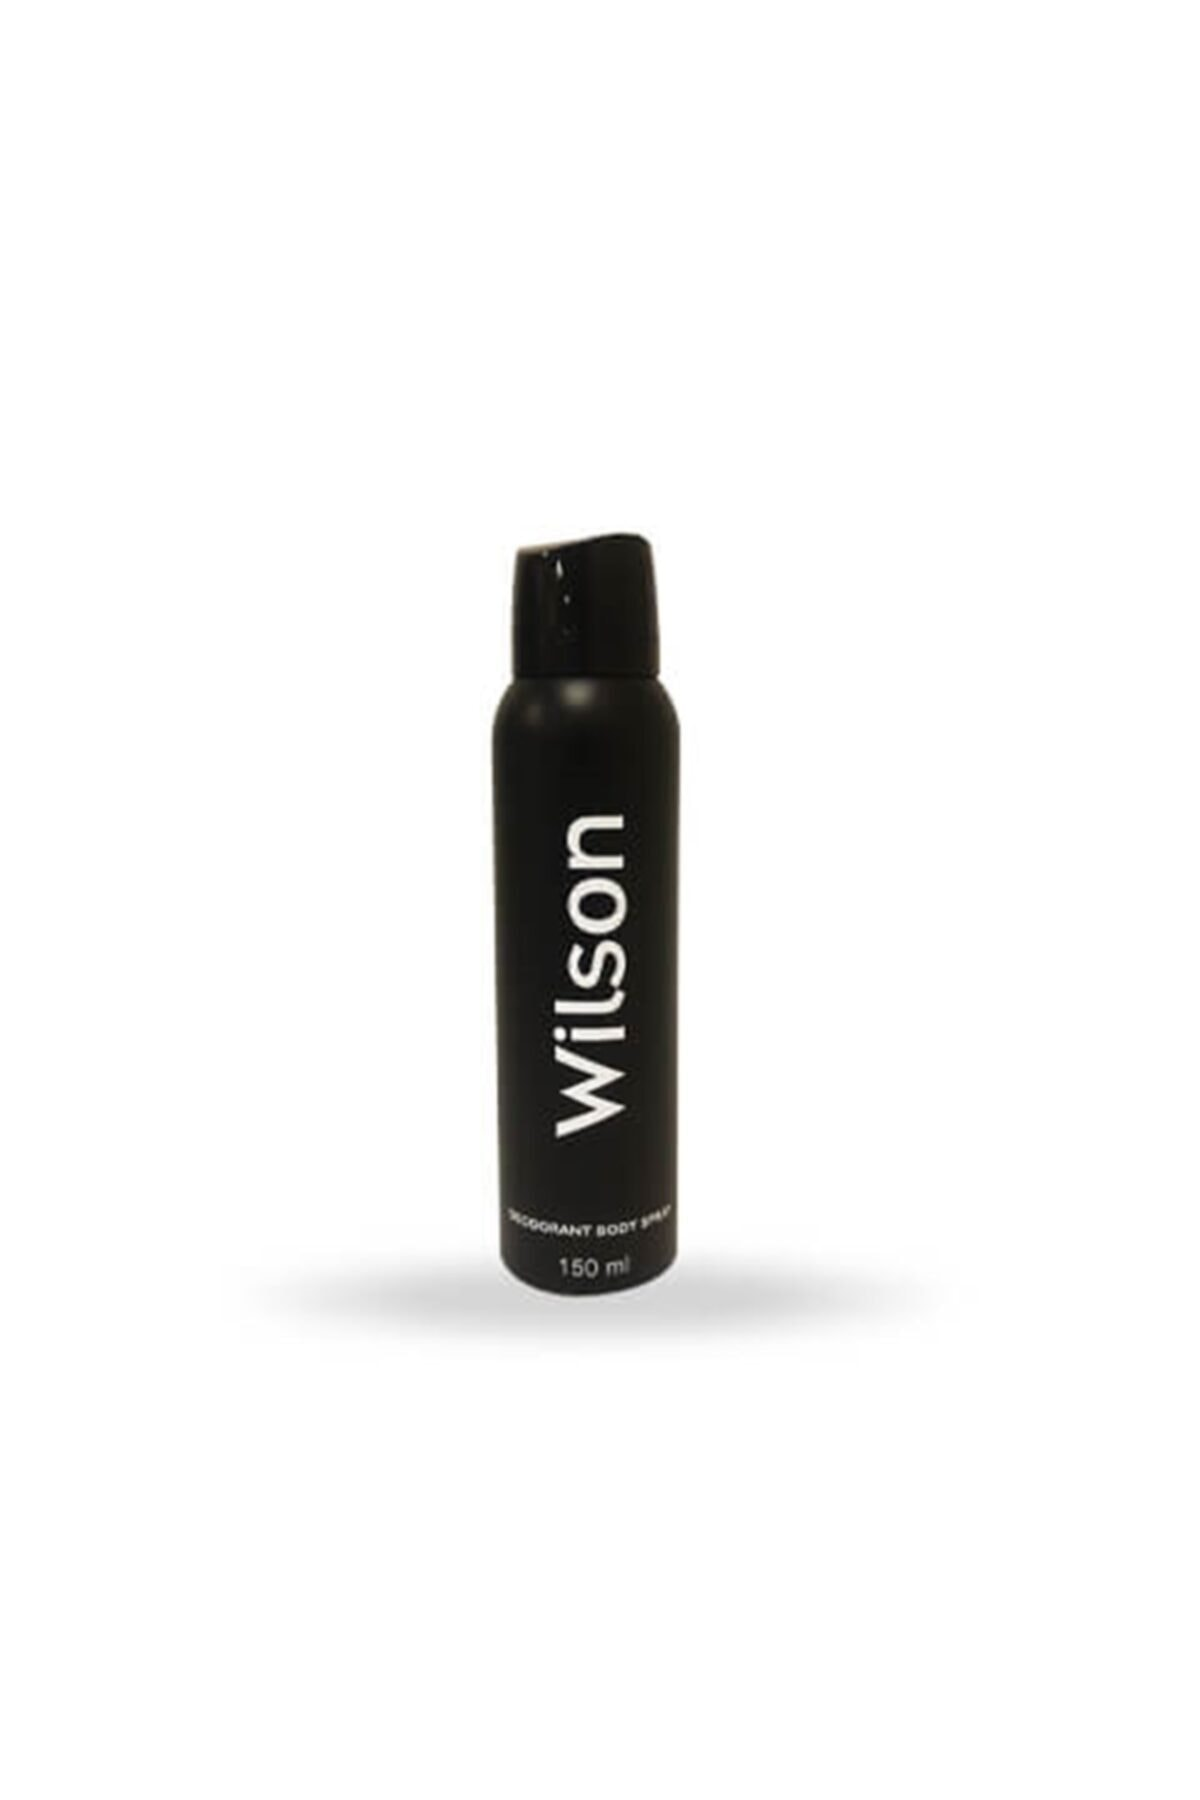 Wilson Erkek Deodorant 150 Ml 1